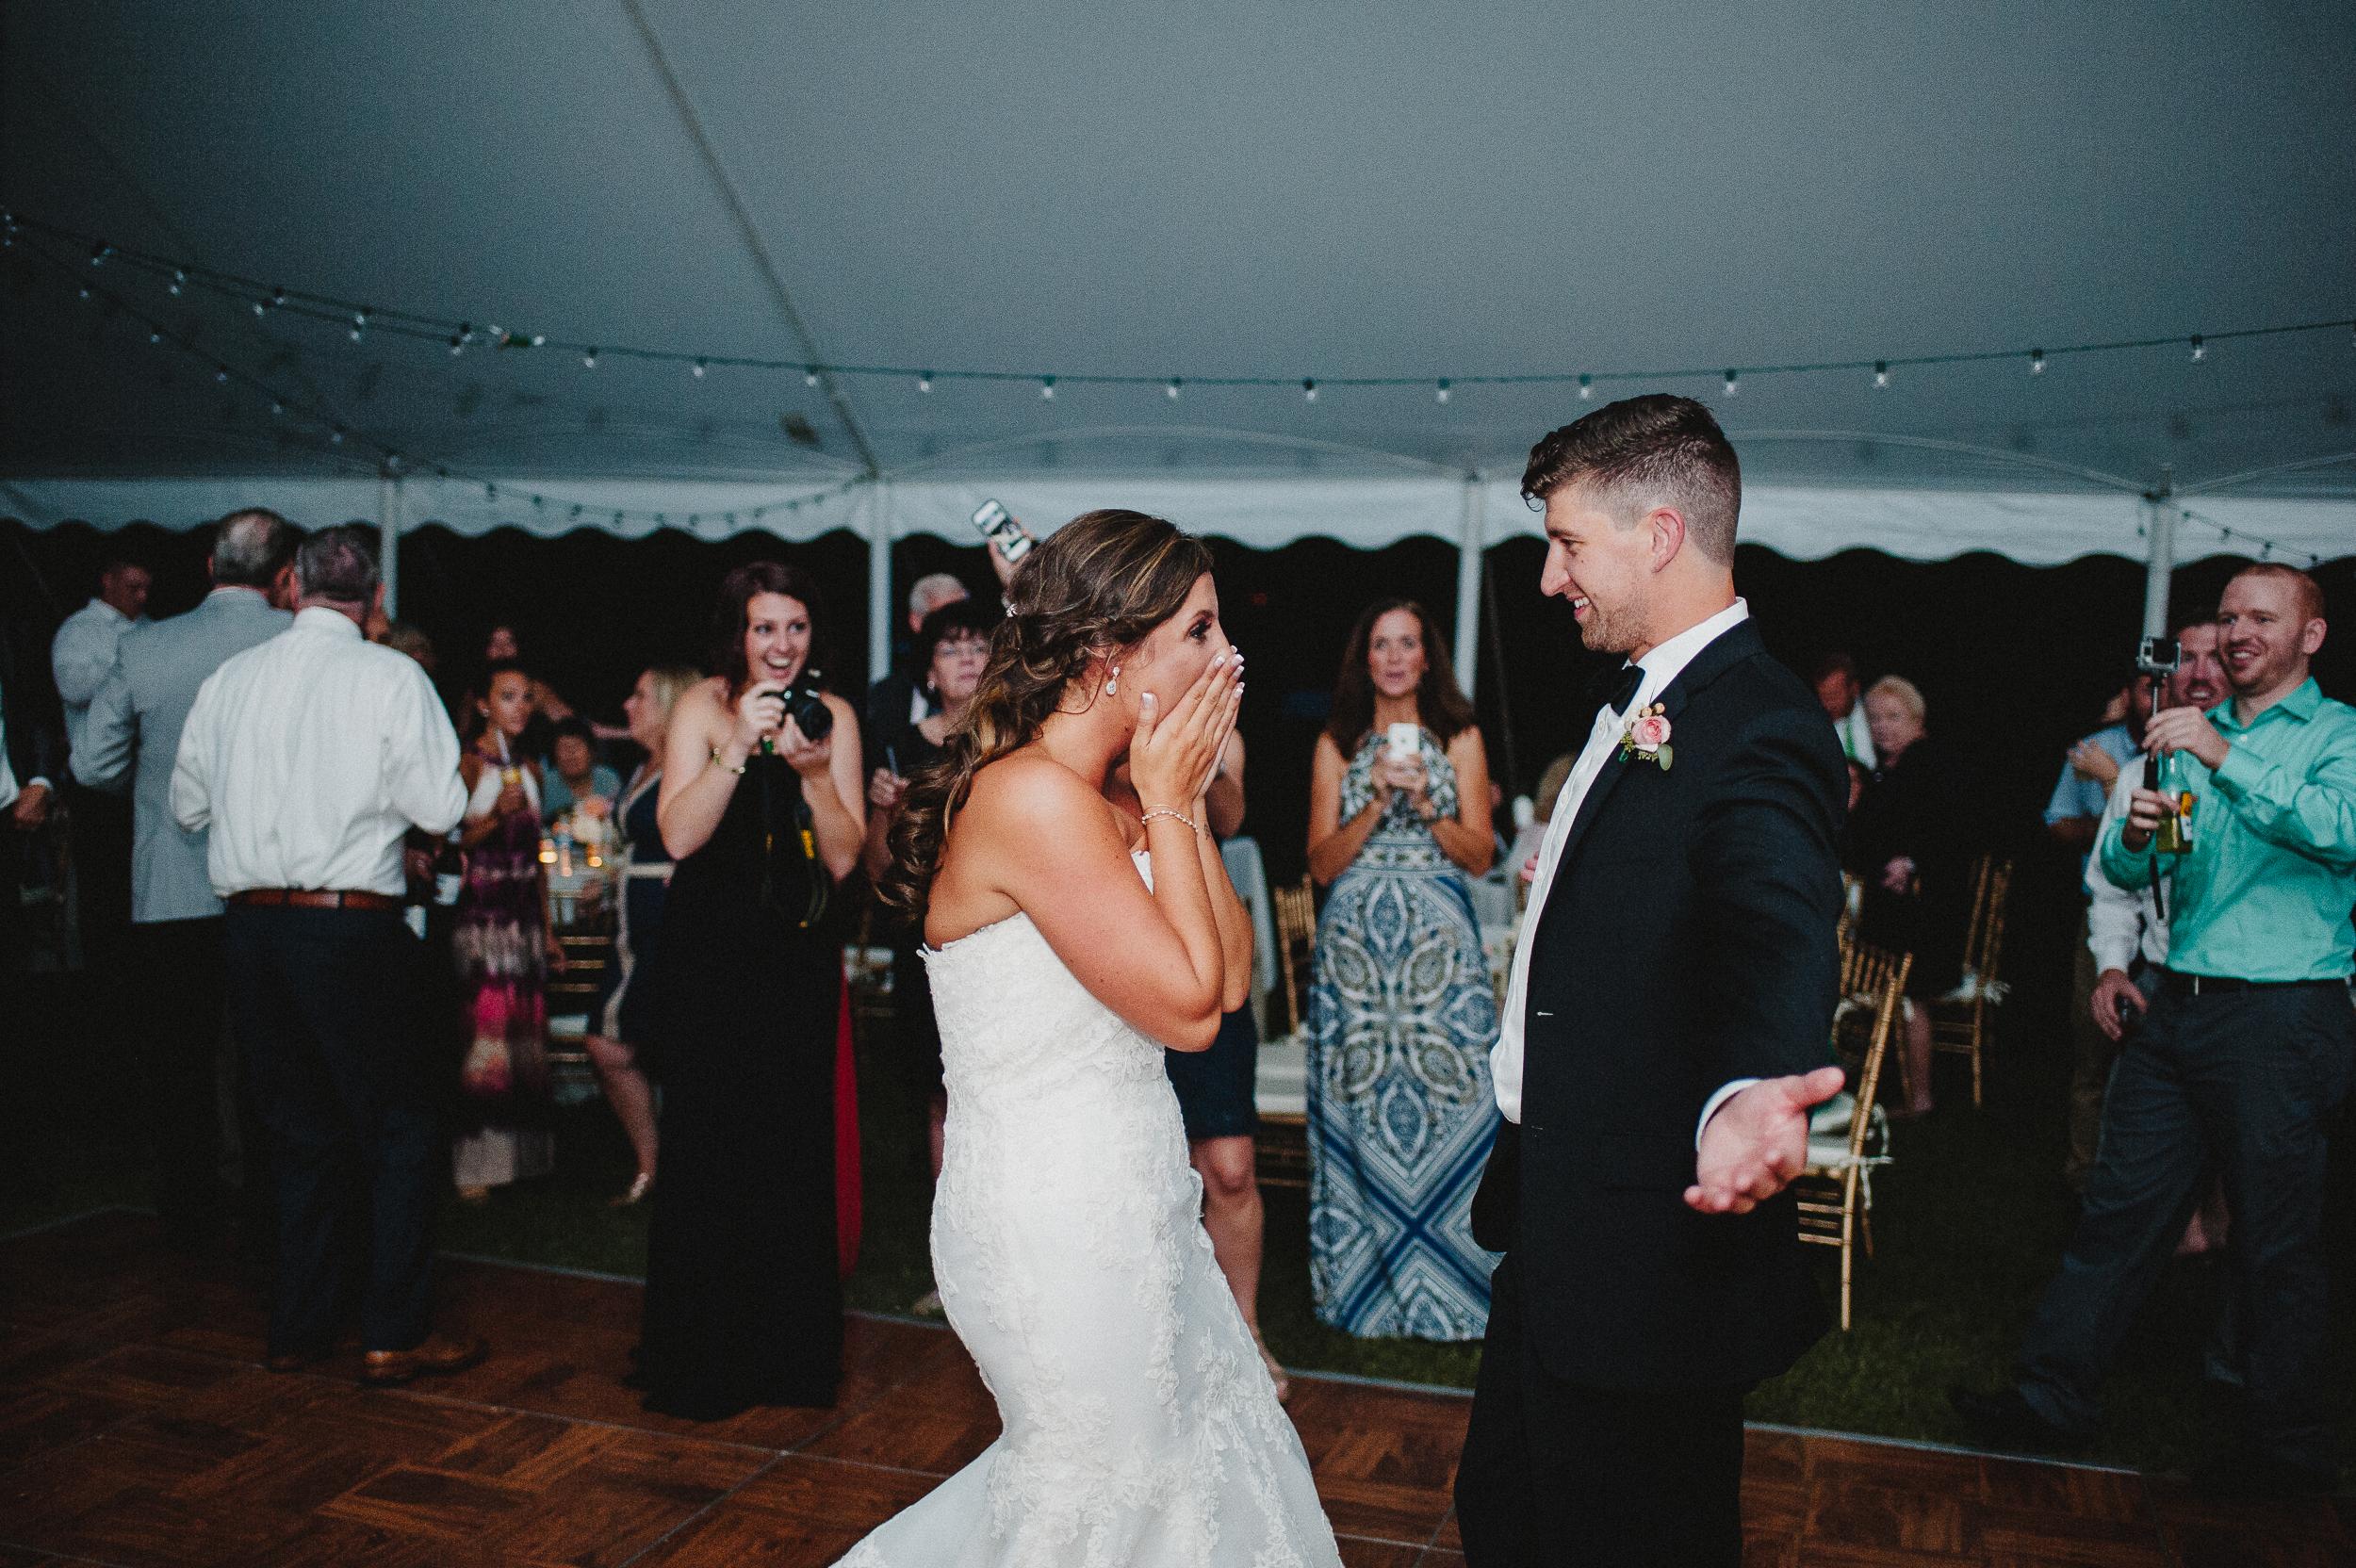 delaware-estate-wedding-photographer-pat-robinson-photography-106.jpg